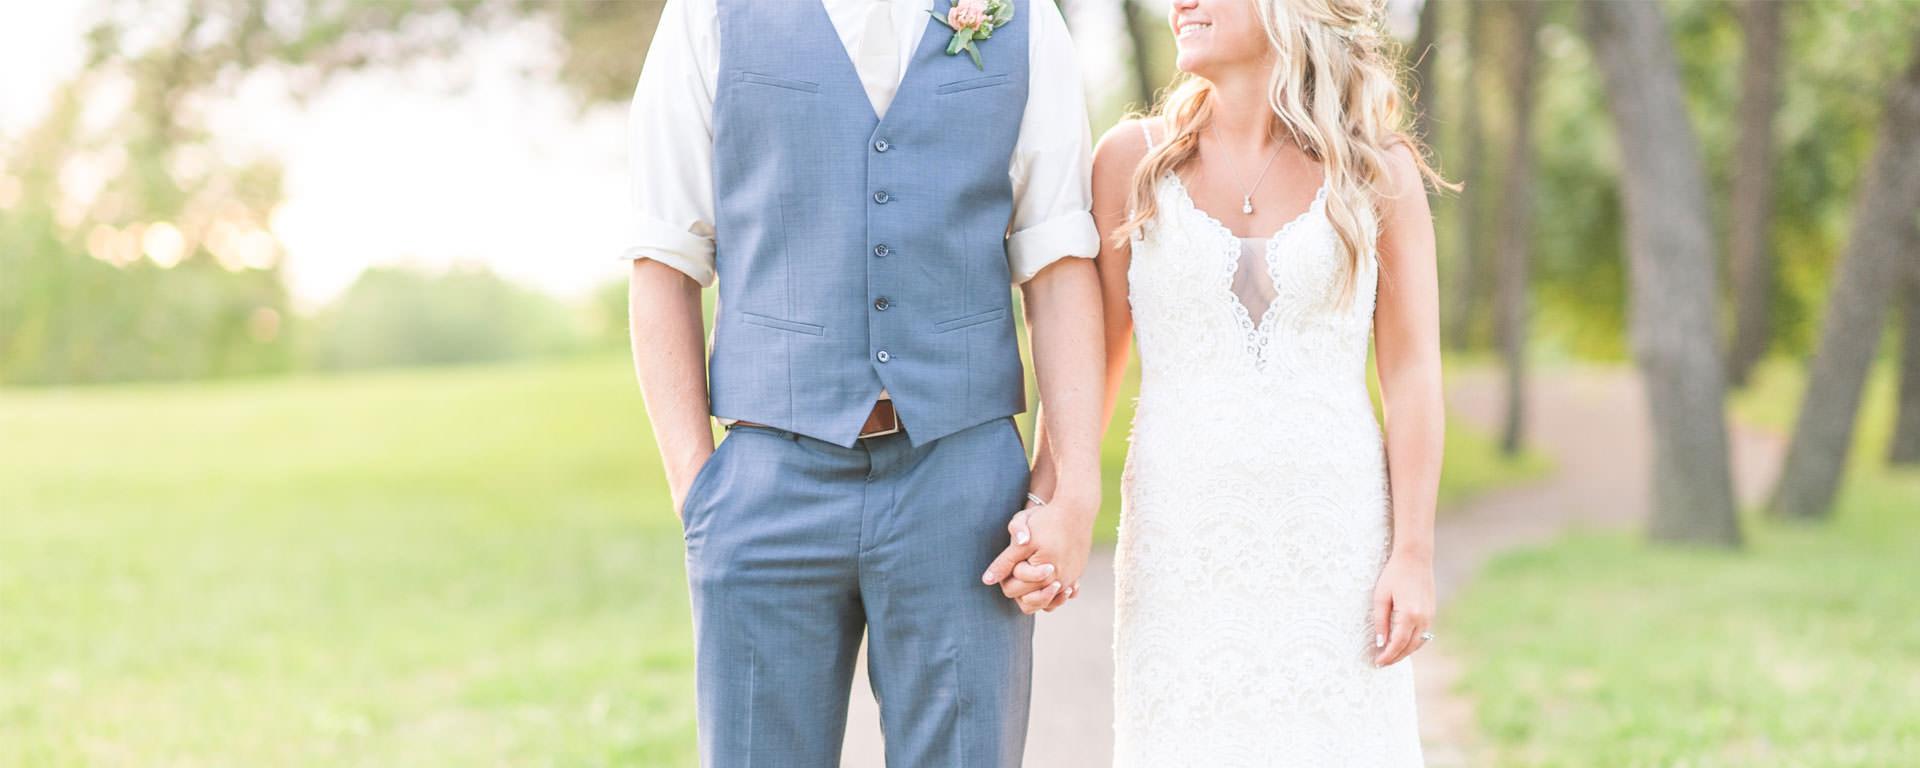 Bride-and-Groom-Slider